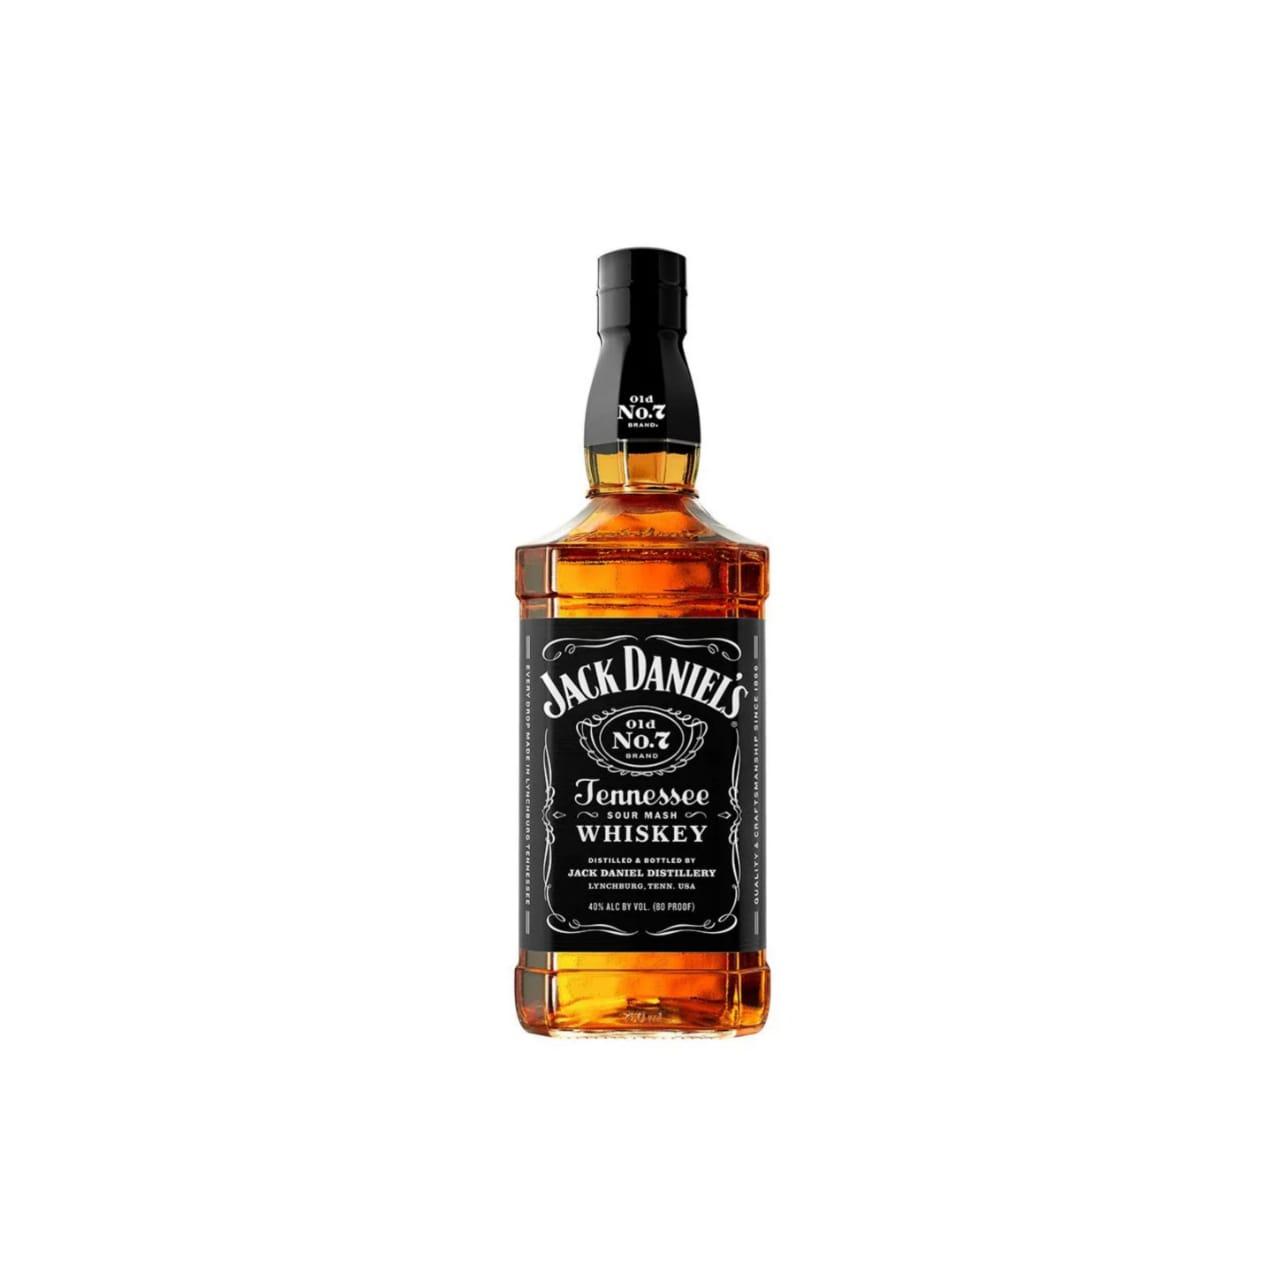 JACK DANIELS 750 ml